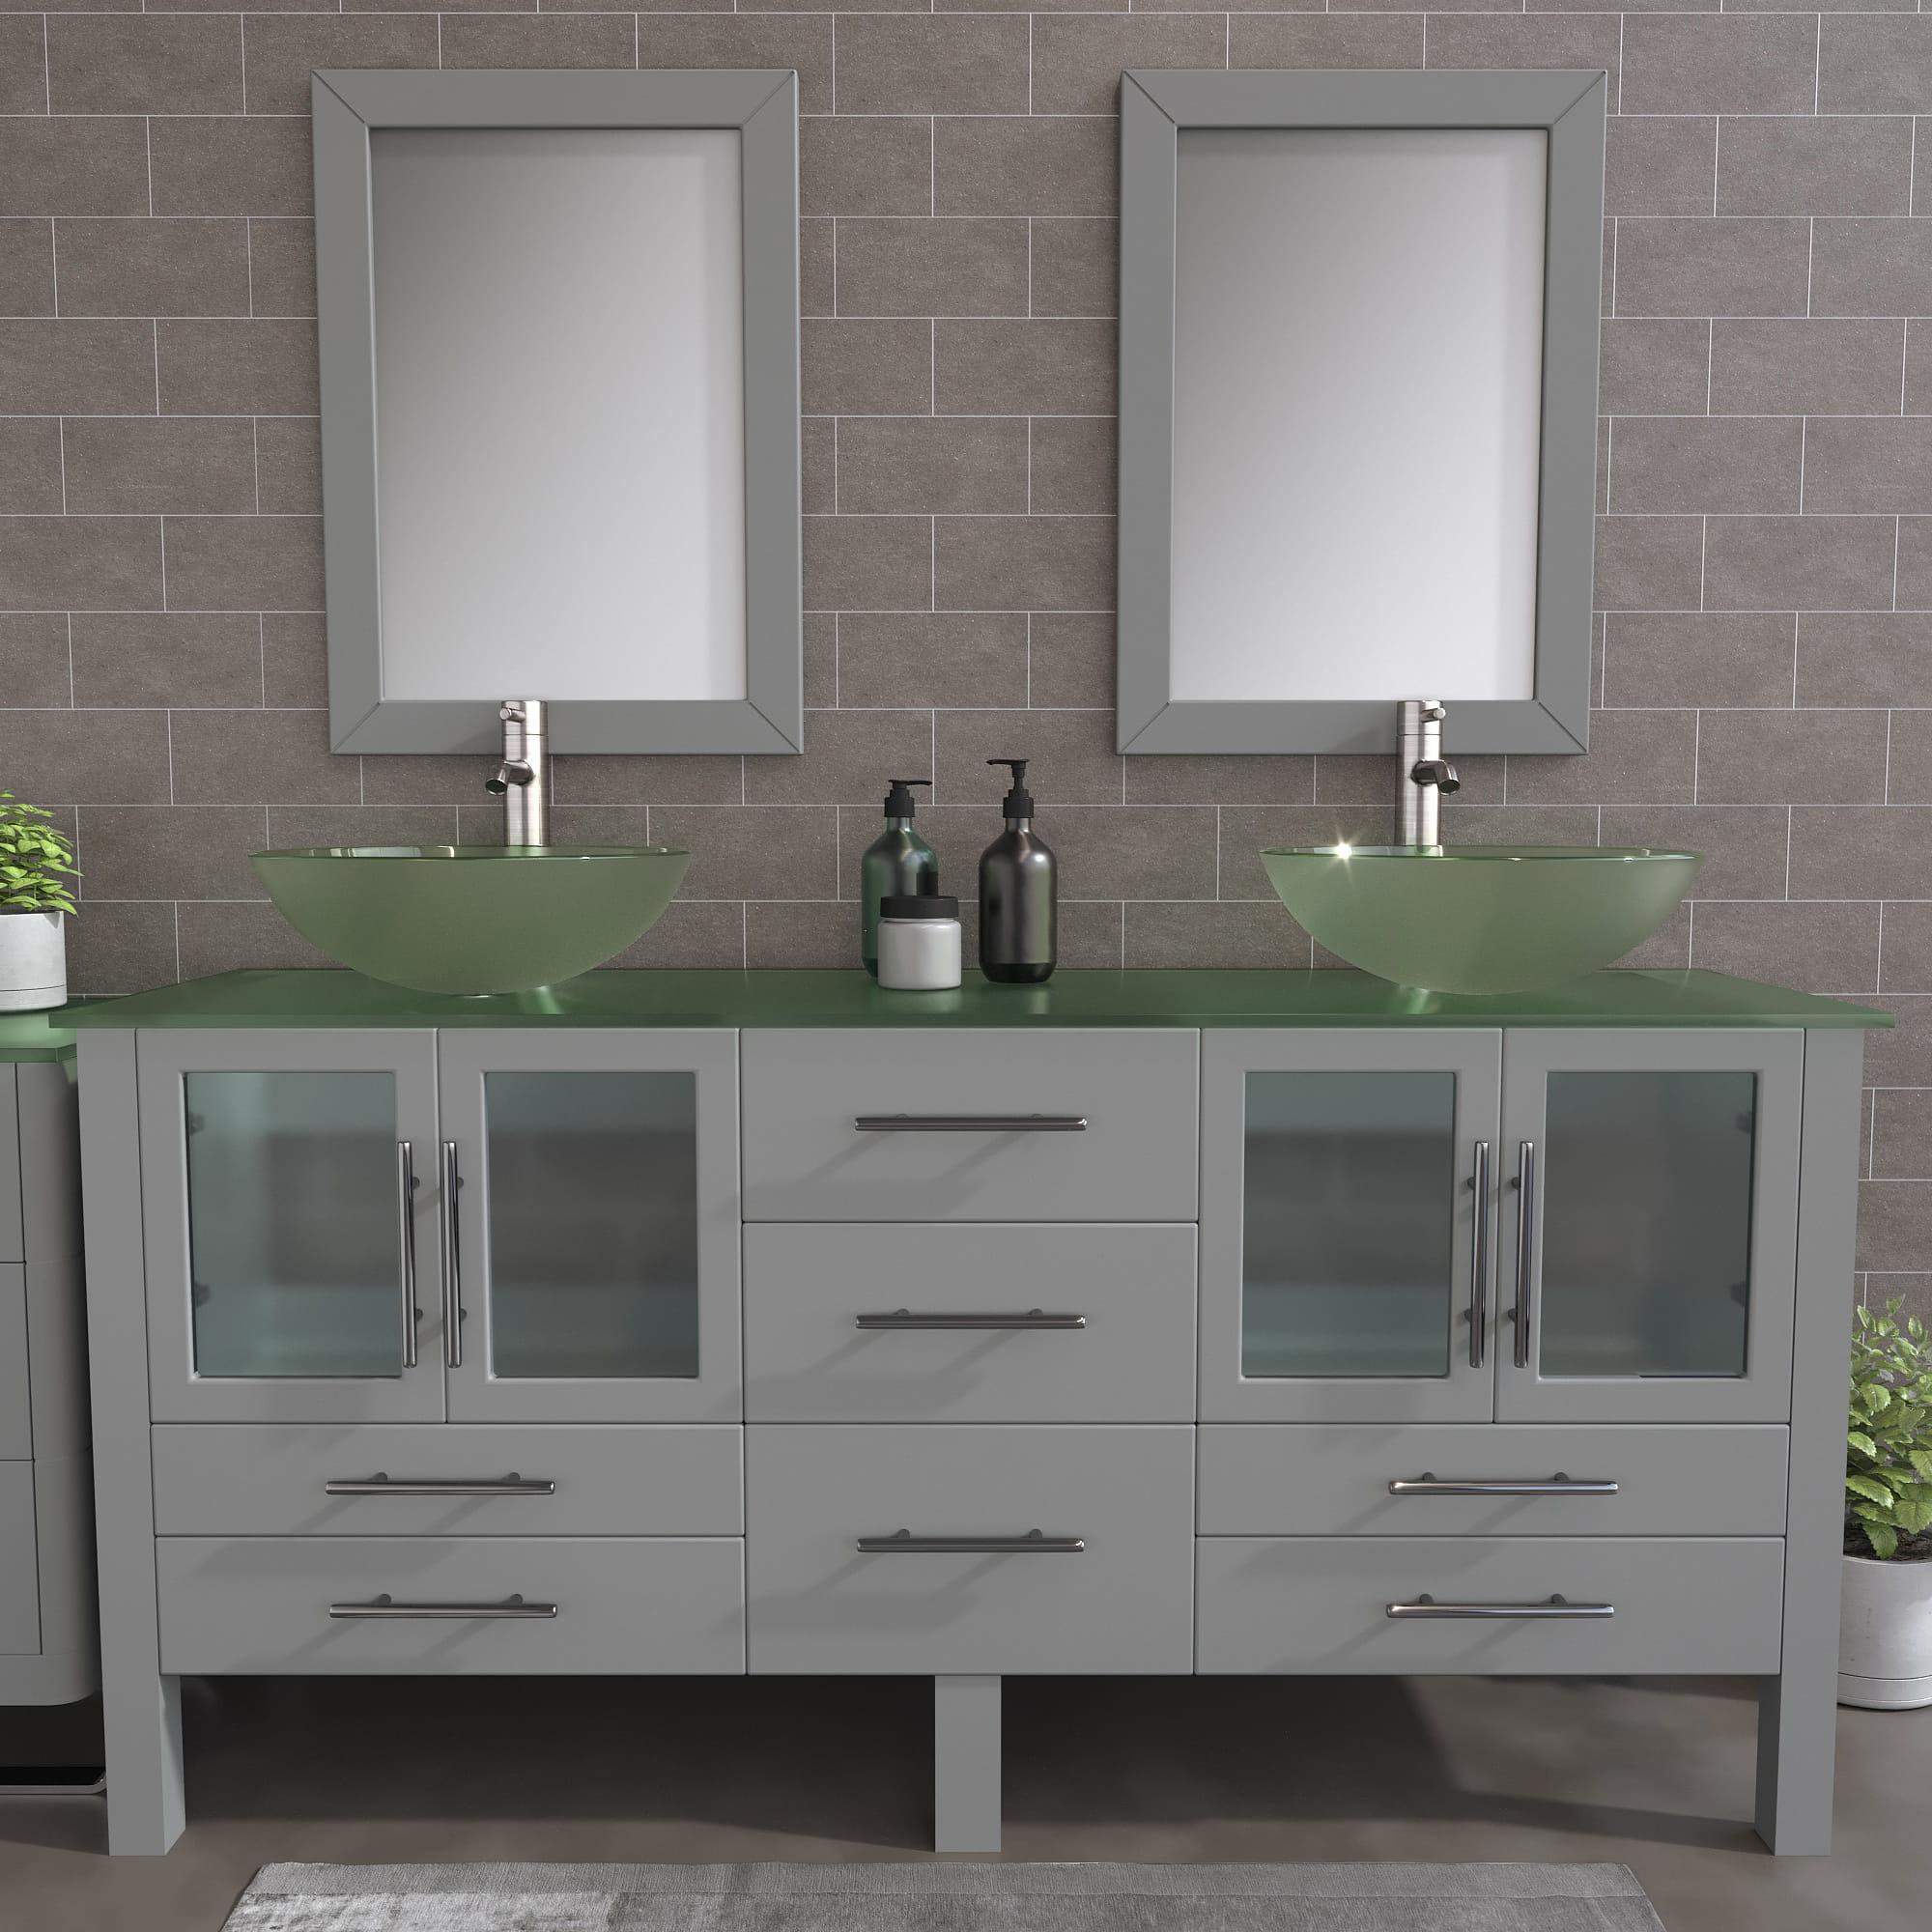 8119BXLG_BN_2 Gray XL Double Glass Vessel Sink Vanity Set